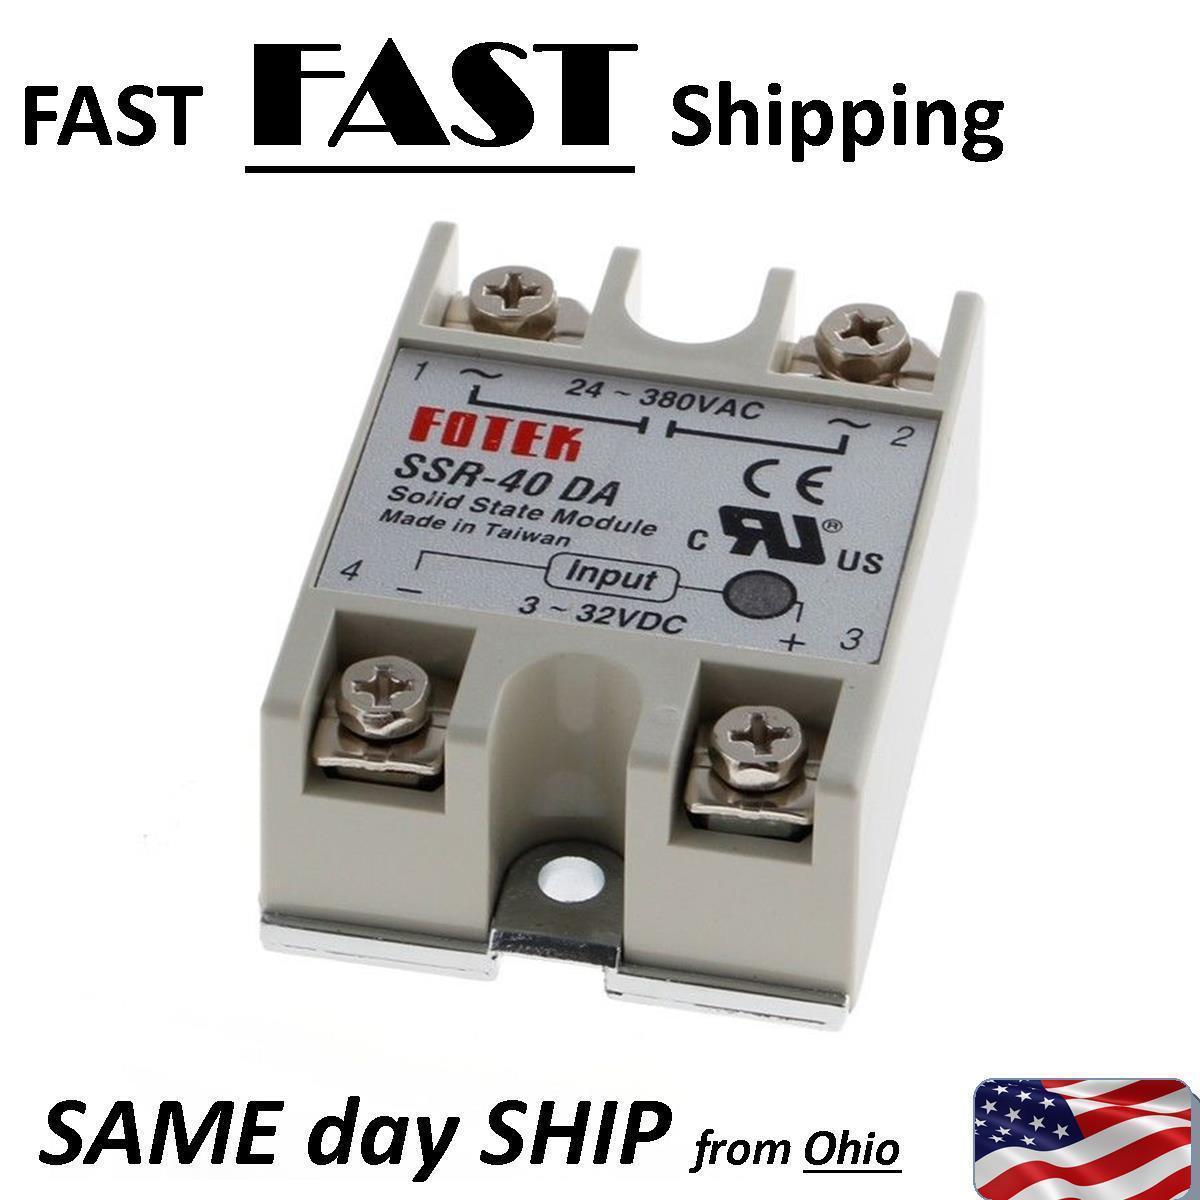 40 Amp Solid State Relay Dc 3v 5v 10v And 50 Similar Items Celduc S L1600